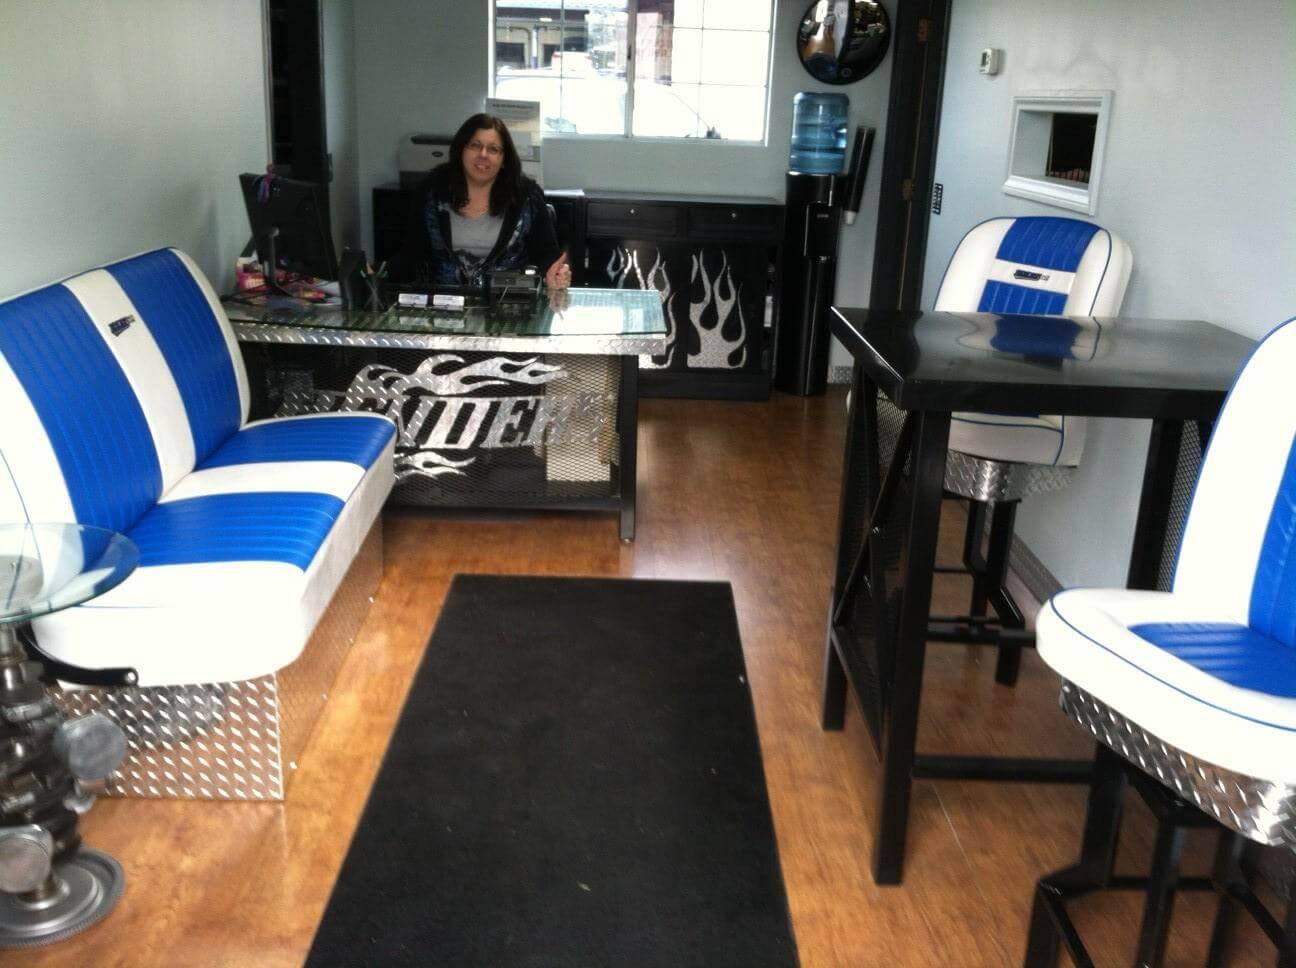 Benders Auto Care In Covina Auto Repair Shop Photos